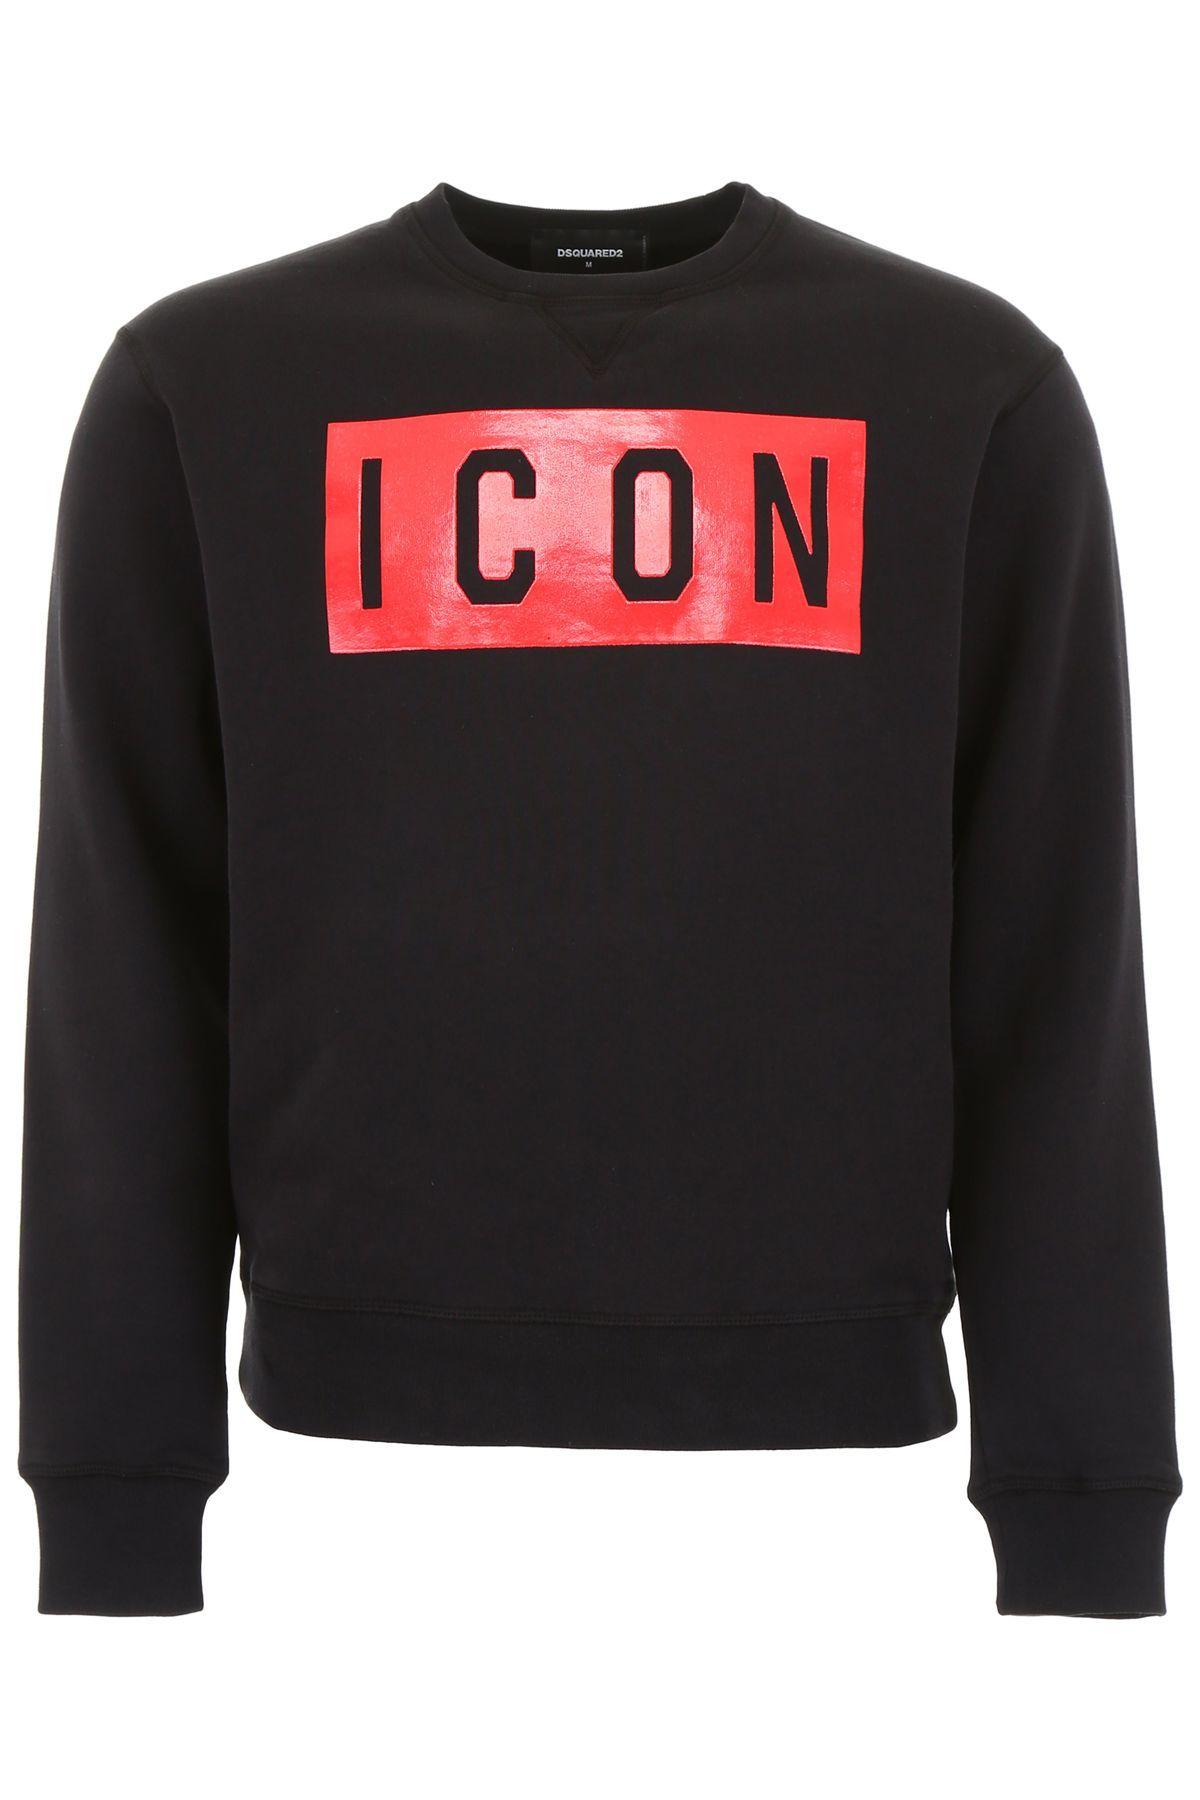 Dsquared2 Icon Sweatshirt Dsquared2 Cloth Sweatshirts Jersey Sweatshirt Long Sleeve Sweatshirts [ 1800 x 1200 Pixel ]